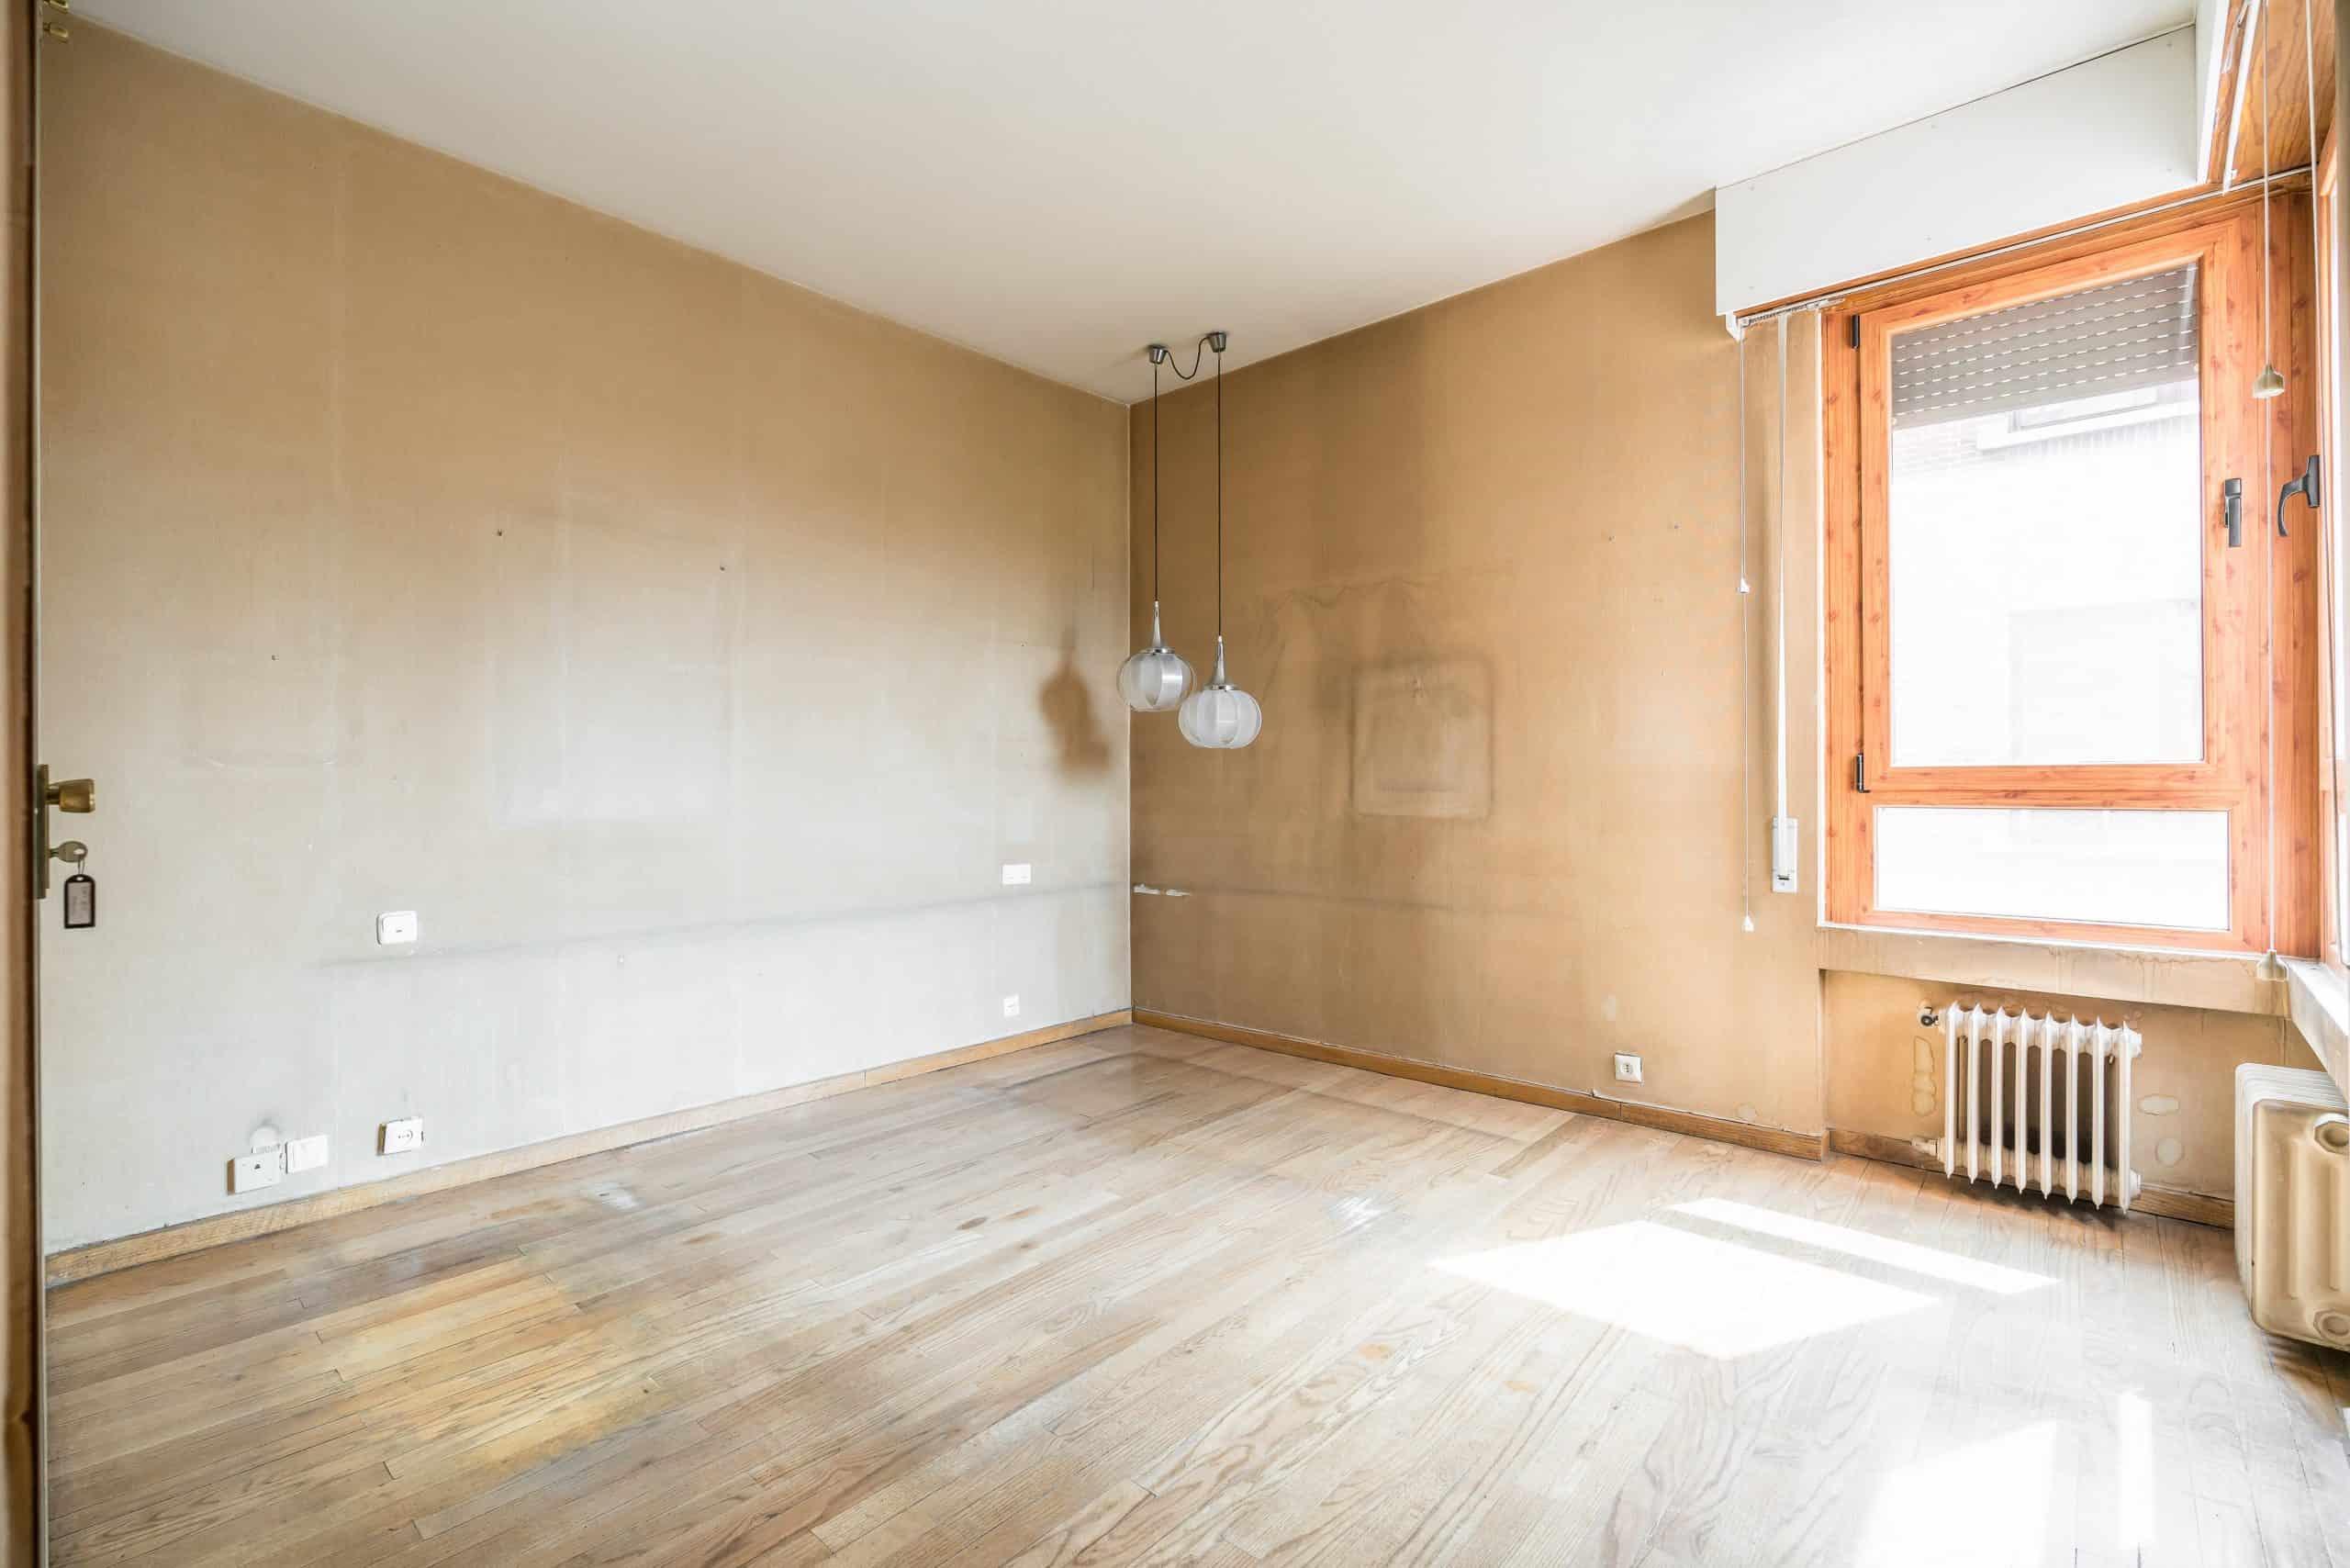 Agencia Inmobiliaria de Madrid-FUTUROCASA-Zona ARGANZUELA-EMBAJADORES-LEGAZPI -calle Embajadores- baño 15